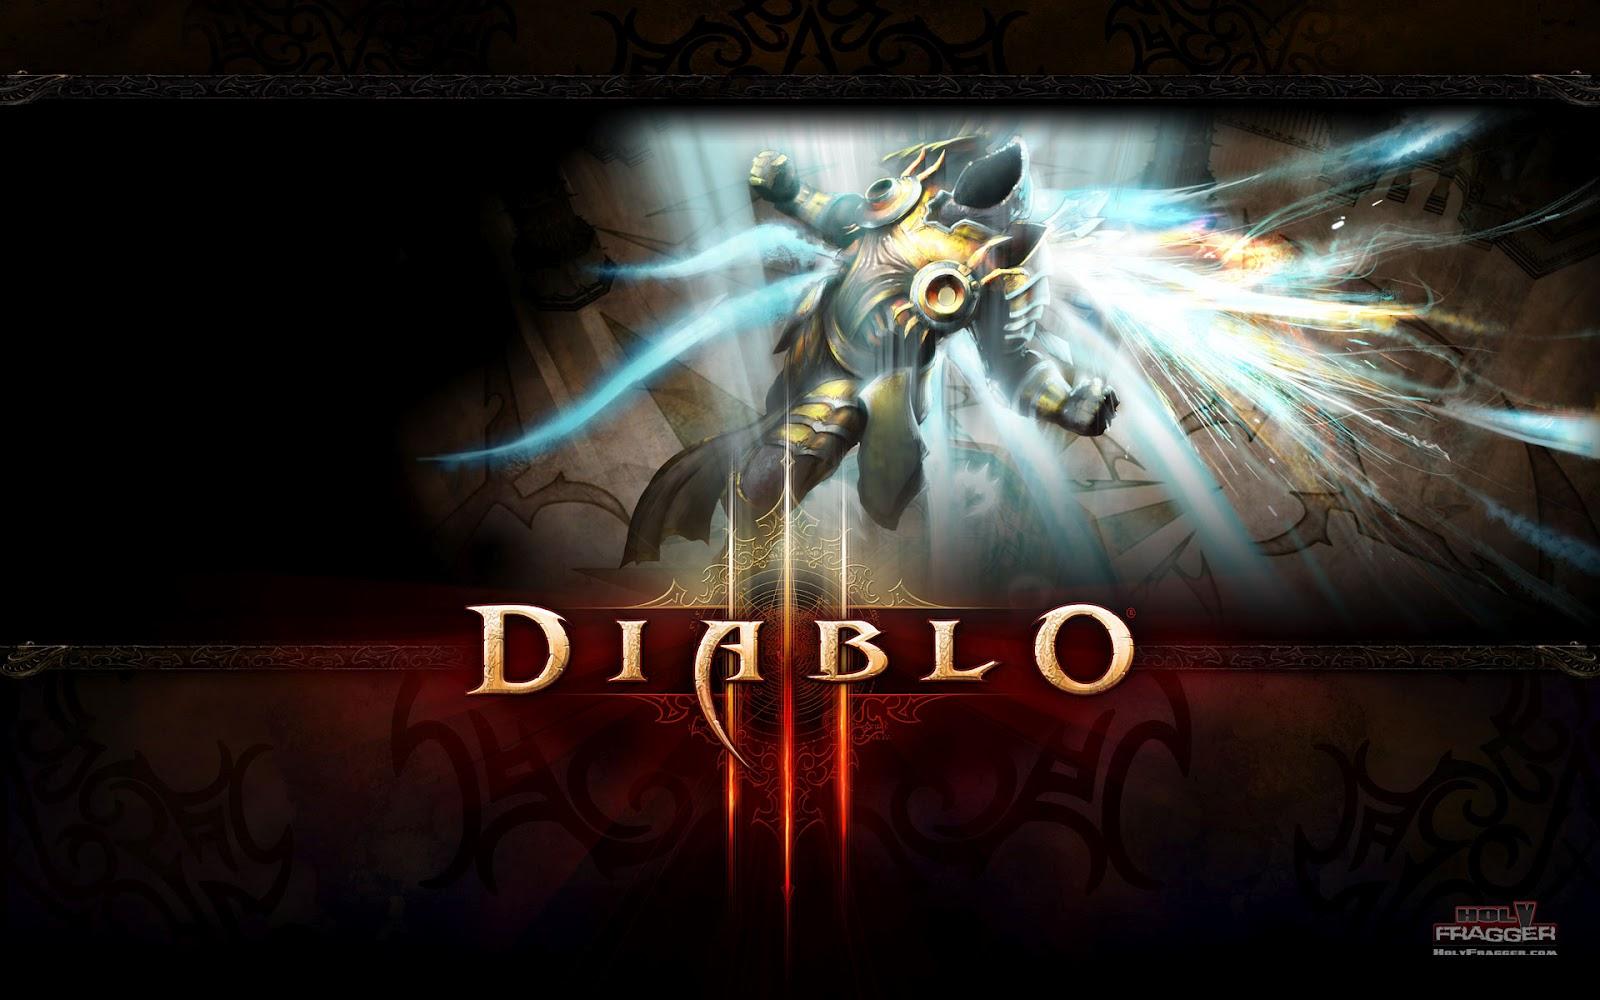 http://1.bp.blogspot.com/-IoUTgmkEulI/T7Elym-9tYI/AAAAAAAAAUc/kSLHjKEoFG8/s1600/Diablo+3+Wallpaper+9.jpg